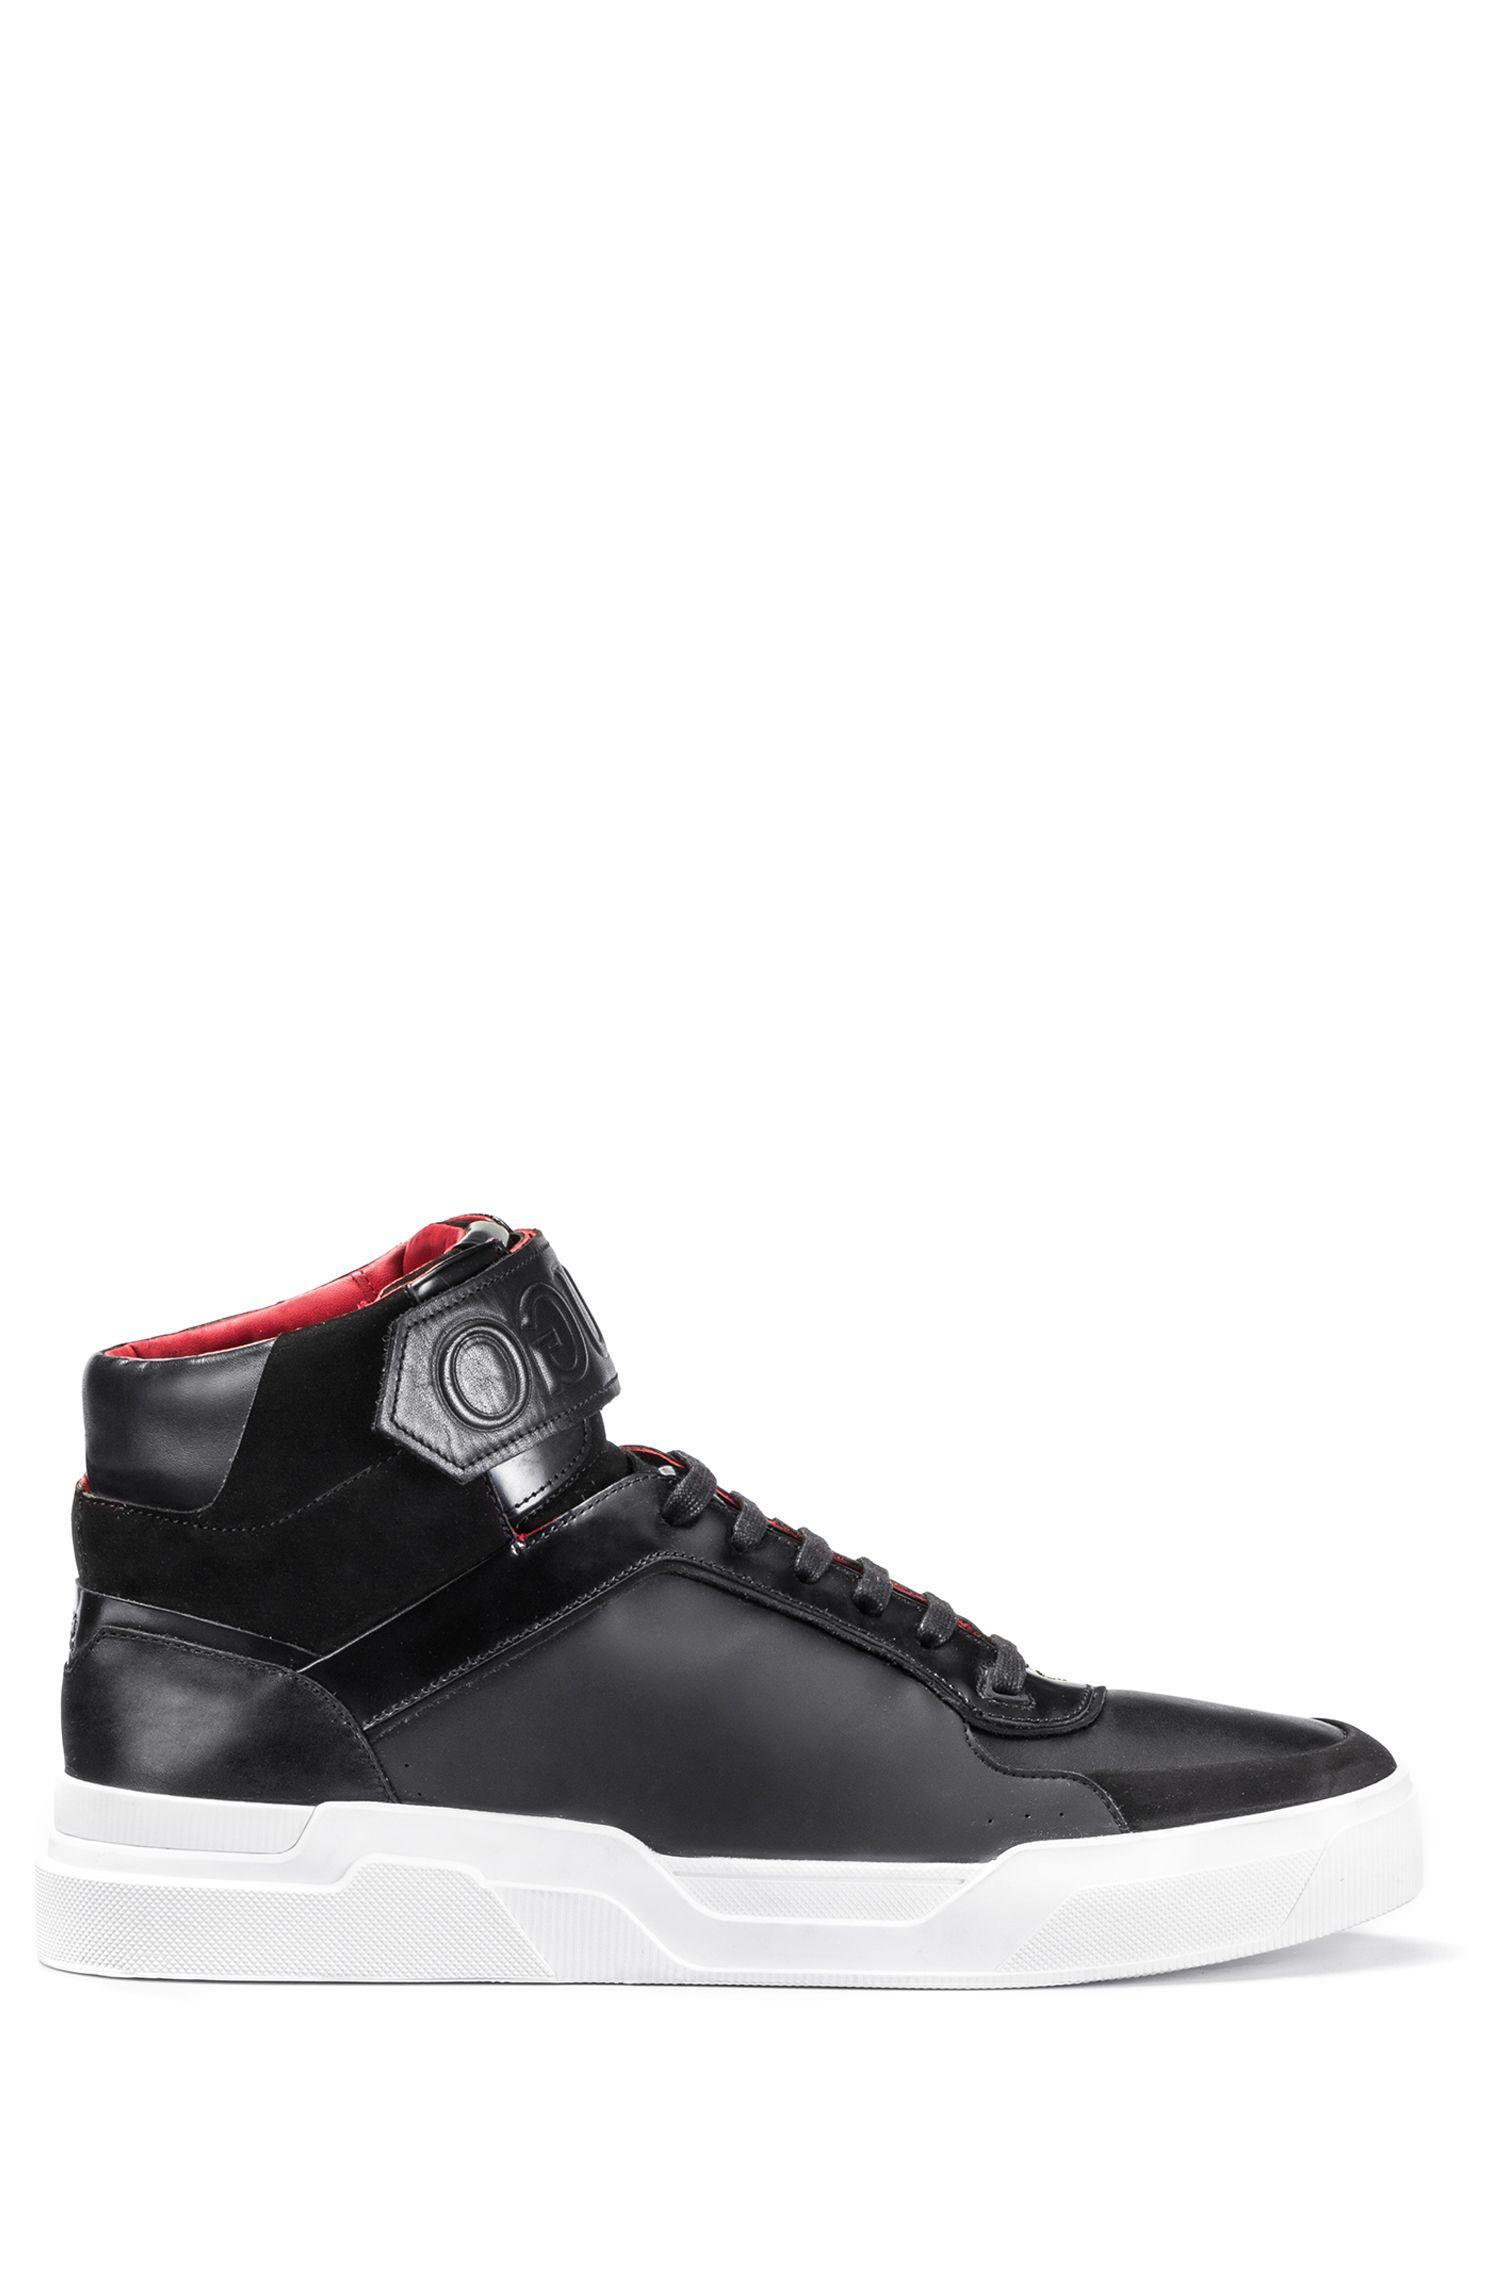 Leather High-Top Sneaker | Symmetric Hito Hugo